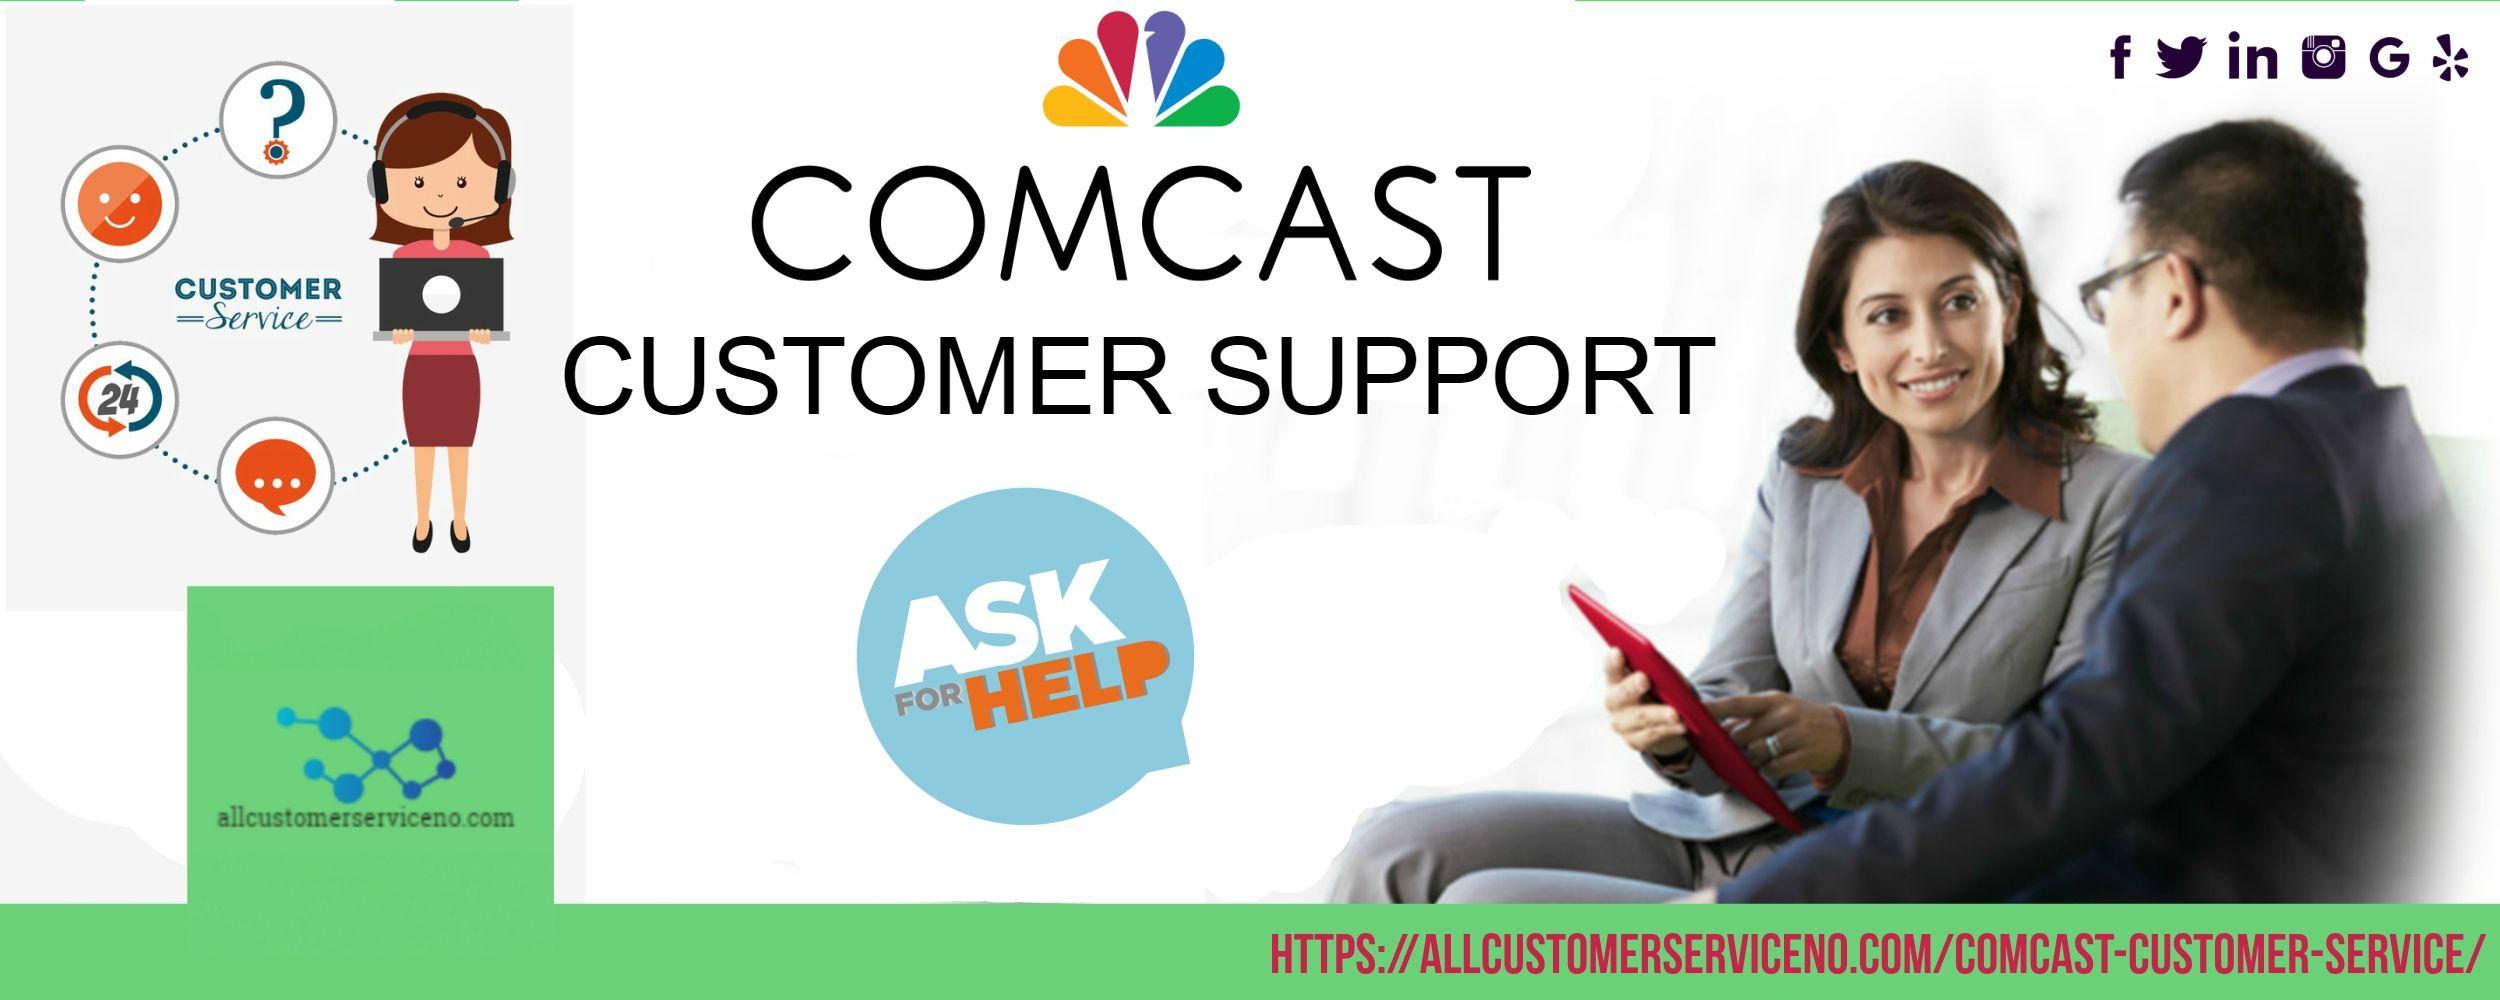 Comcast Customer Service Number +1 8009346489 Comcast